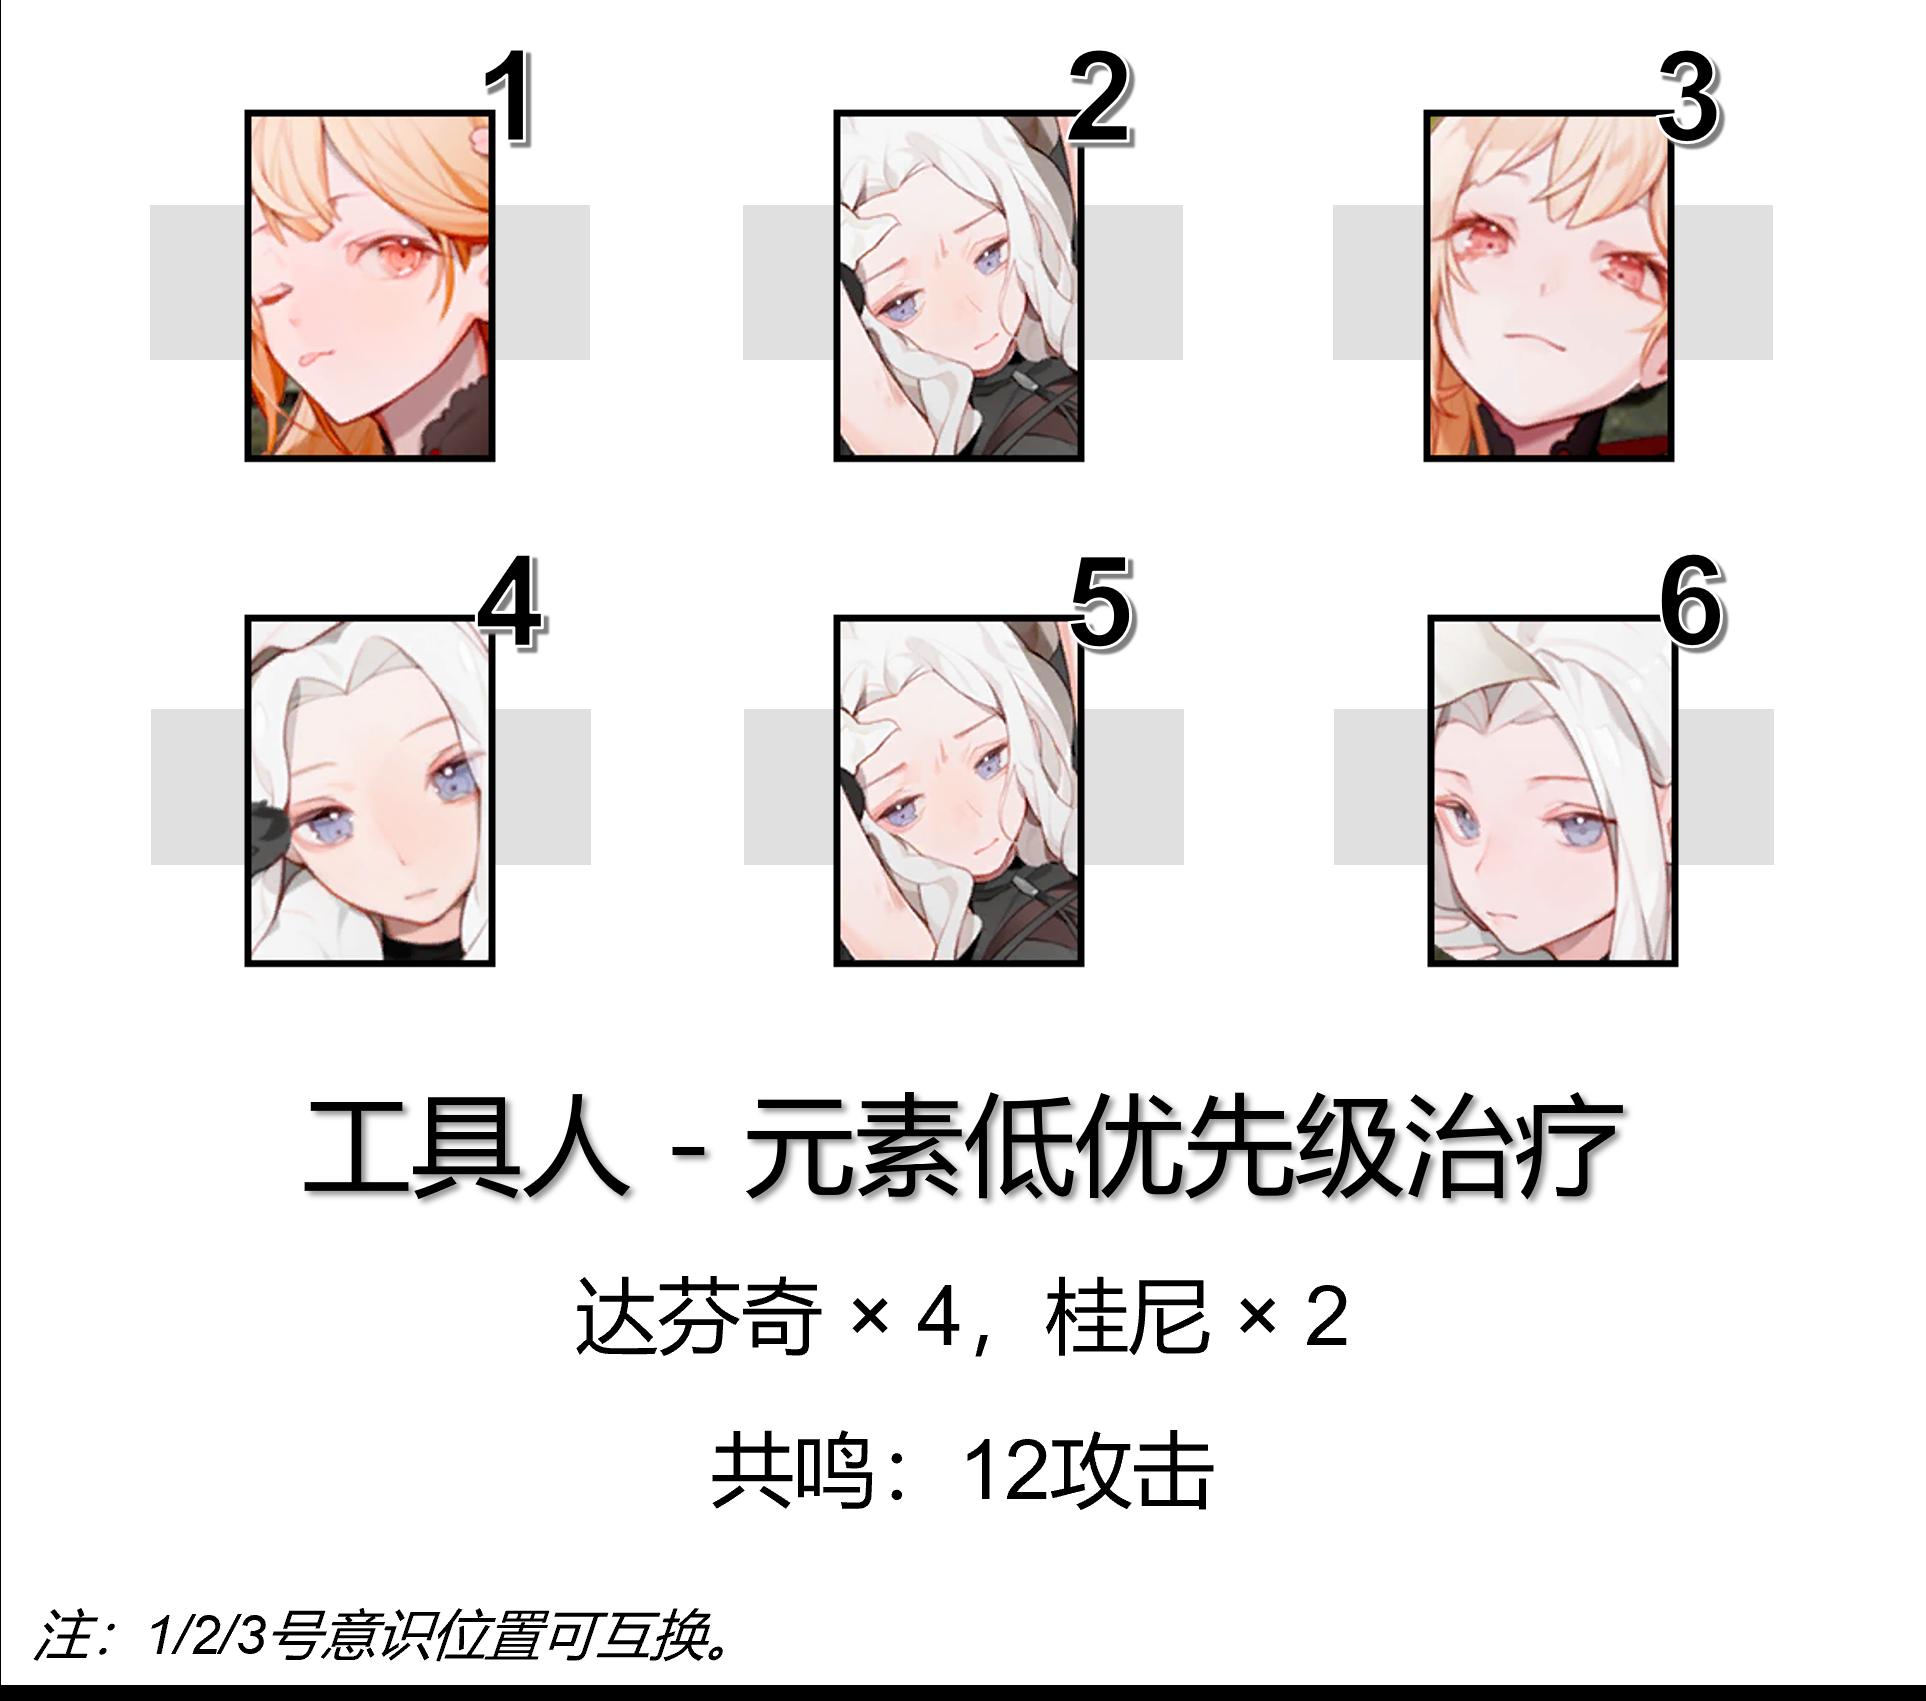 PP 丽芙·仰光 意识推荐2.png